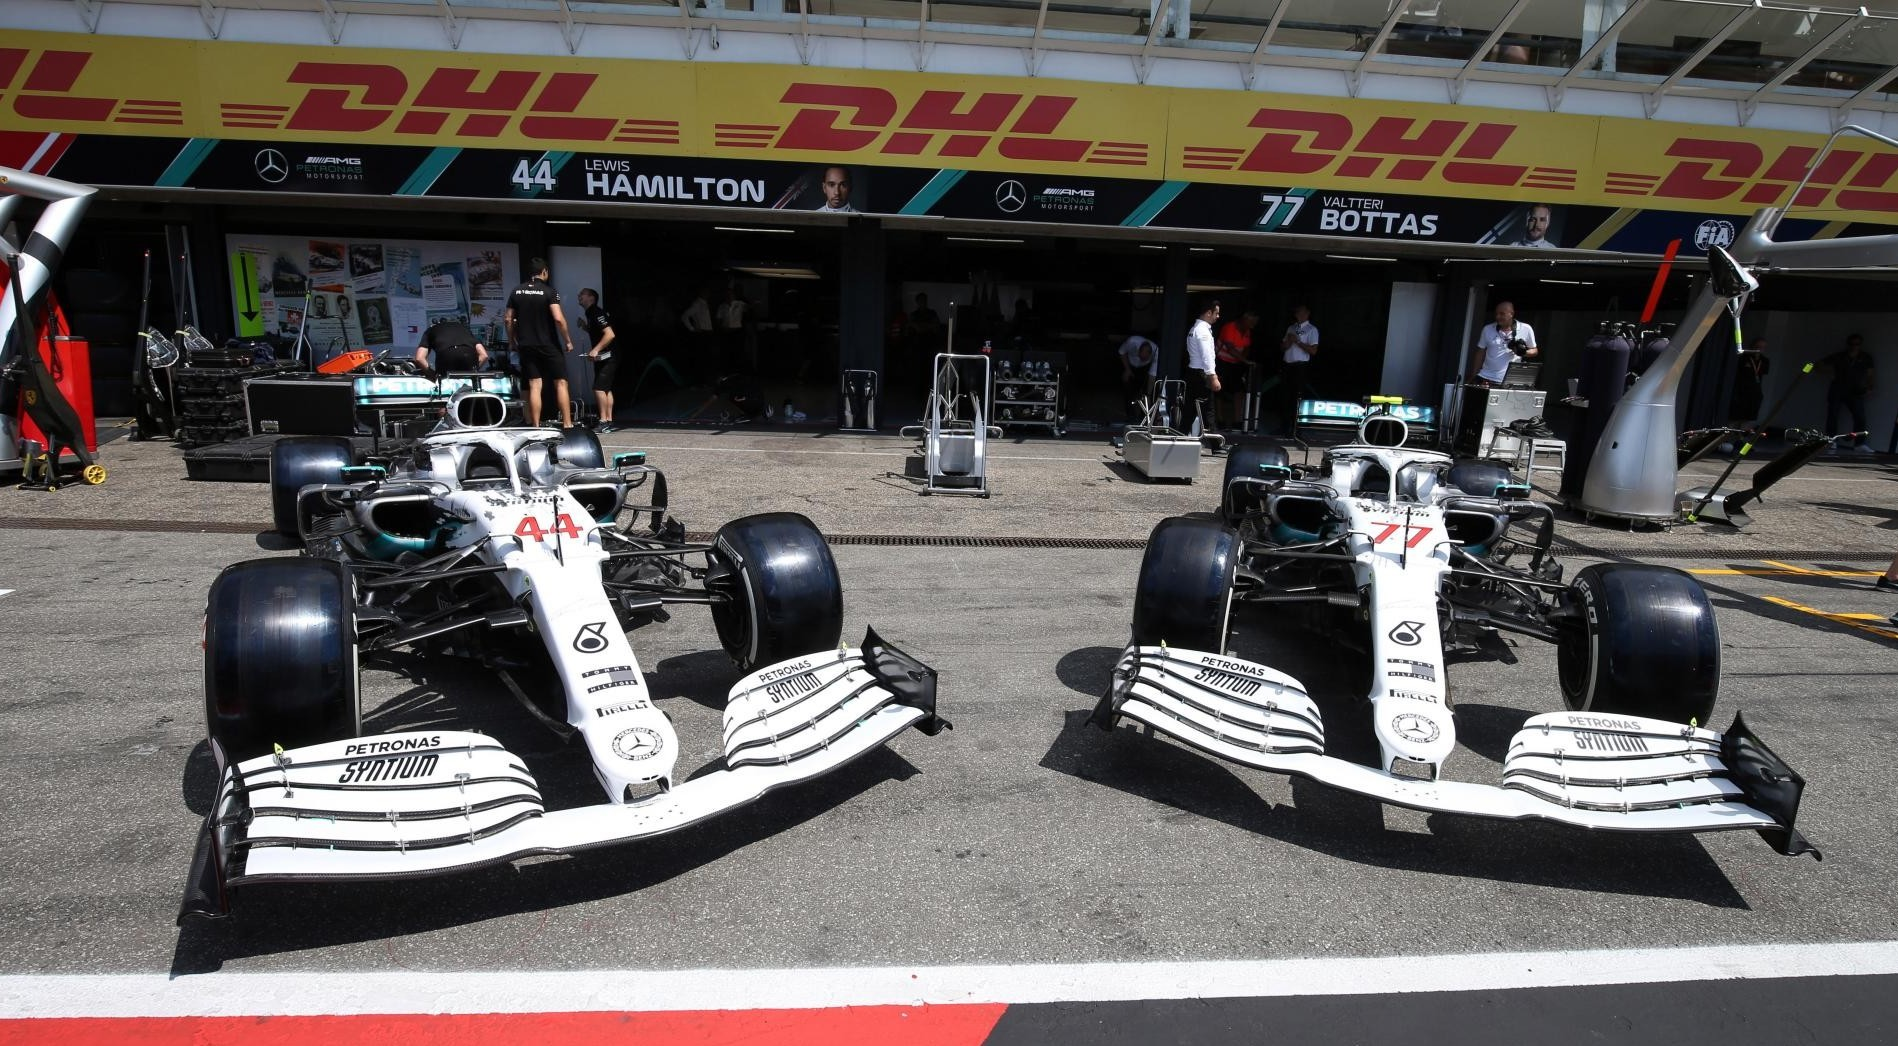 Formula 1 Germania streaming su link, si